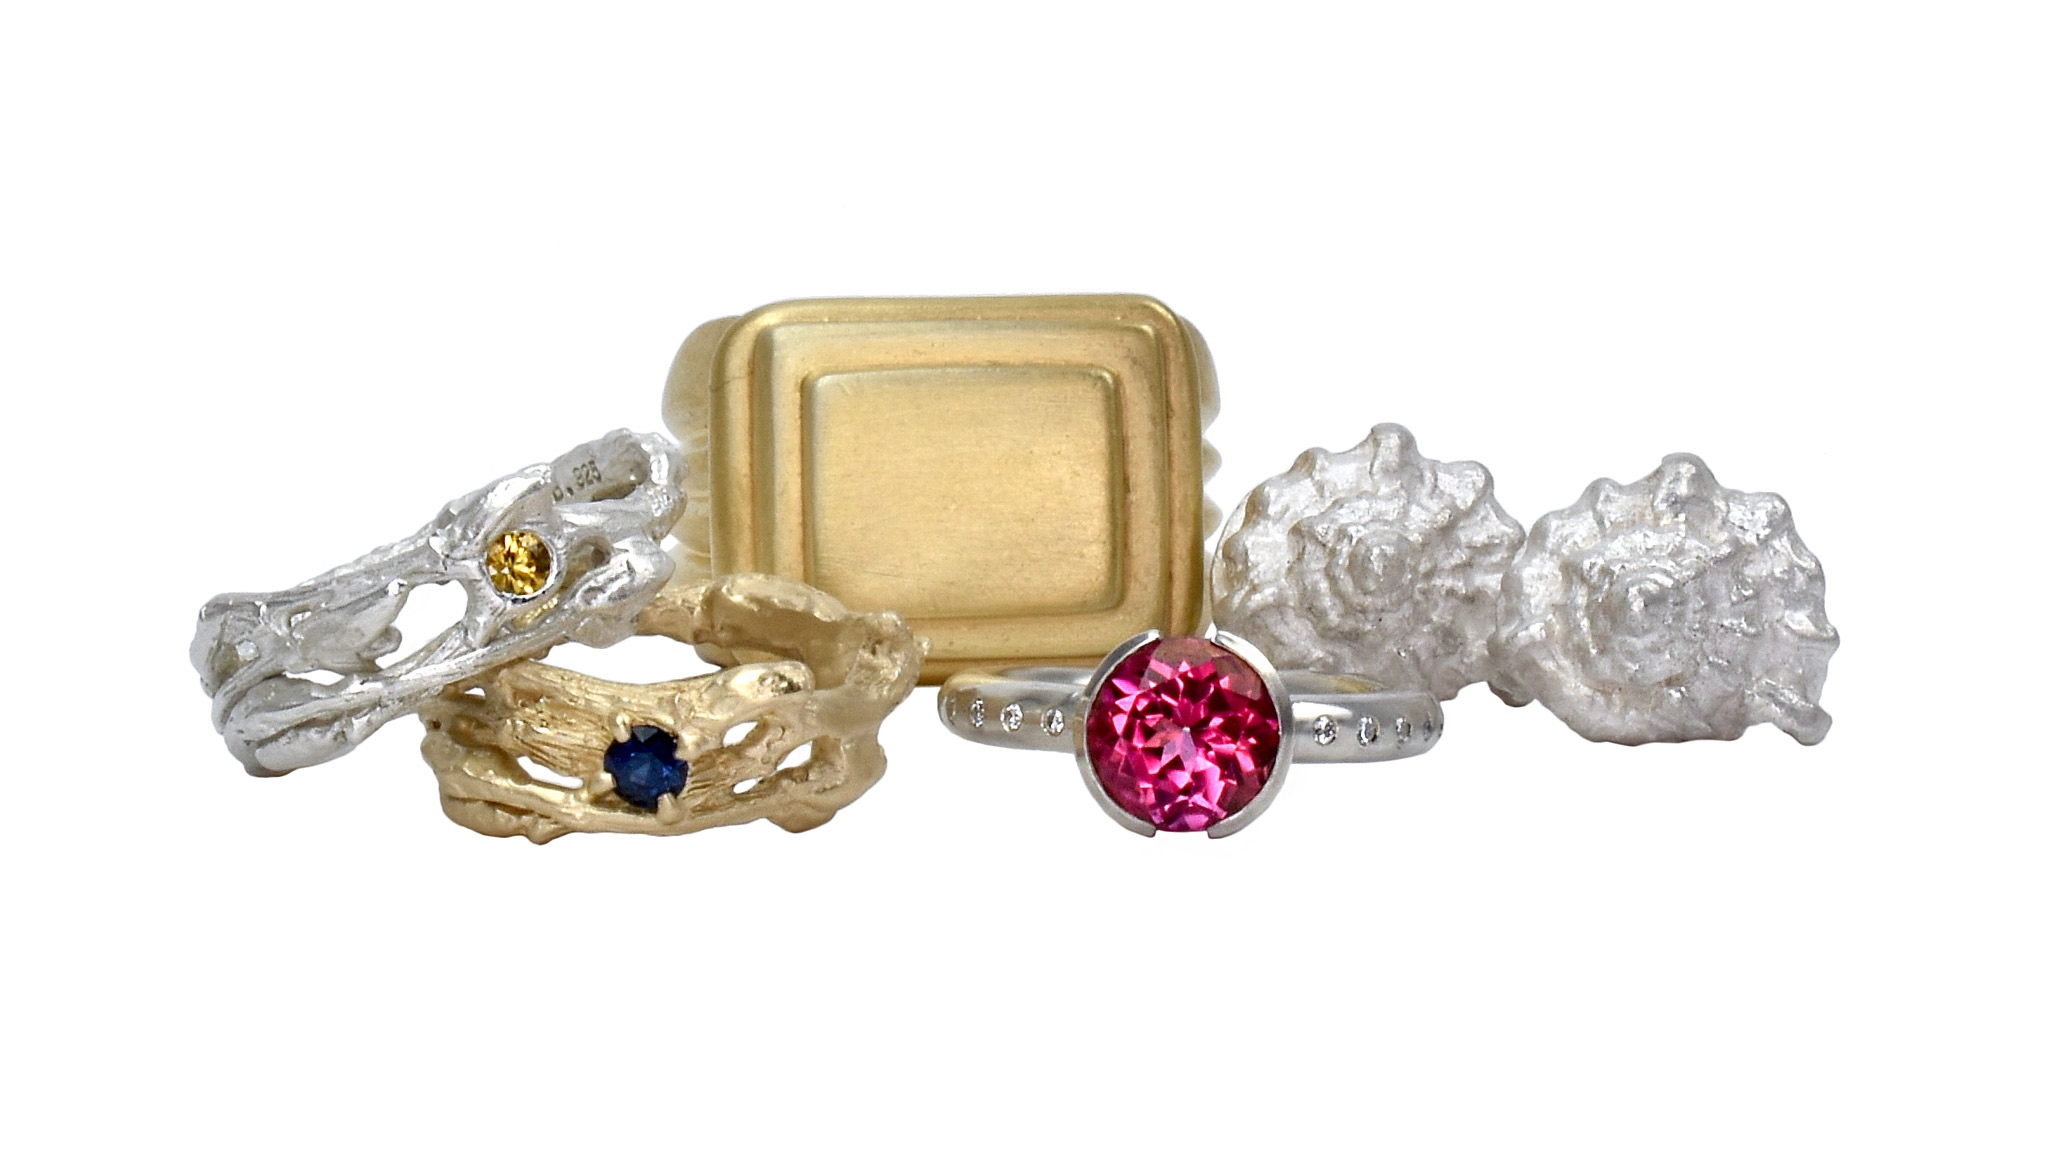 STICK CUFF WITH DIAMONDS BY STÔN